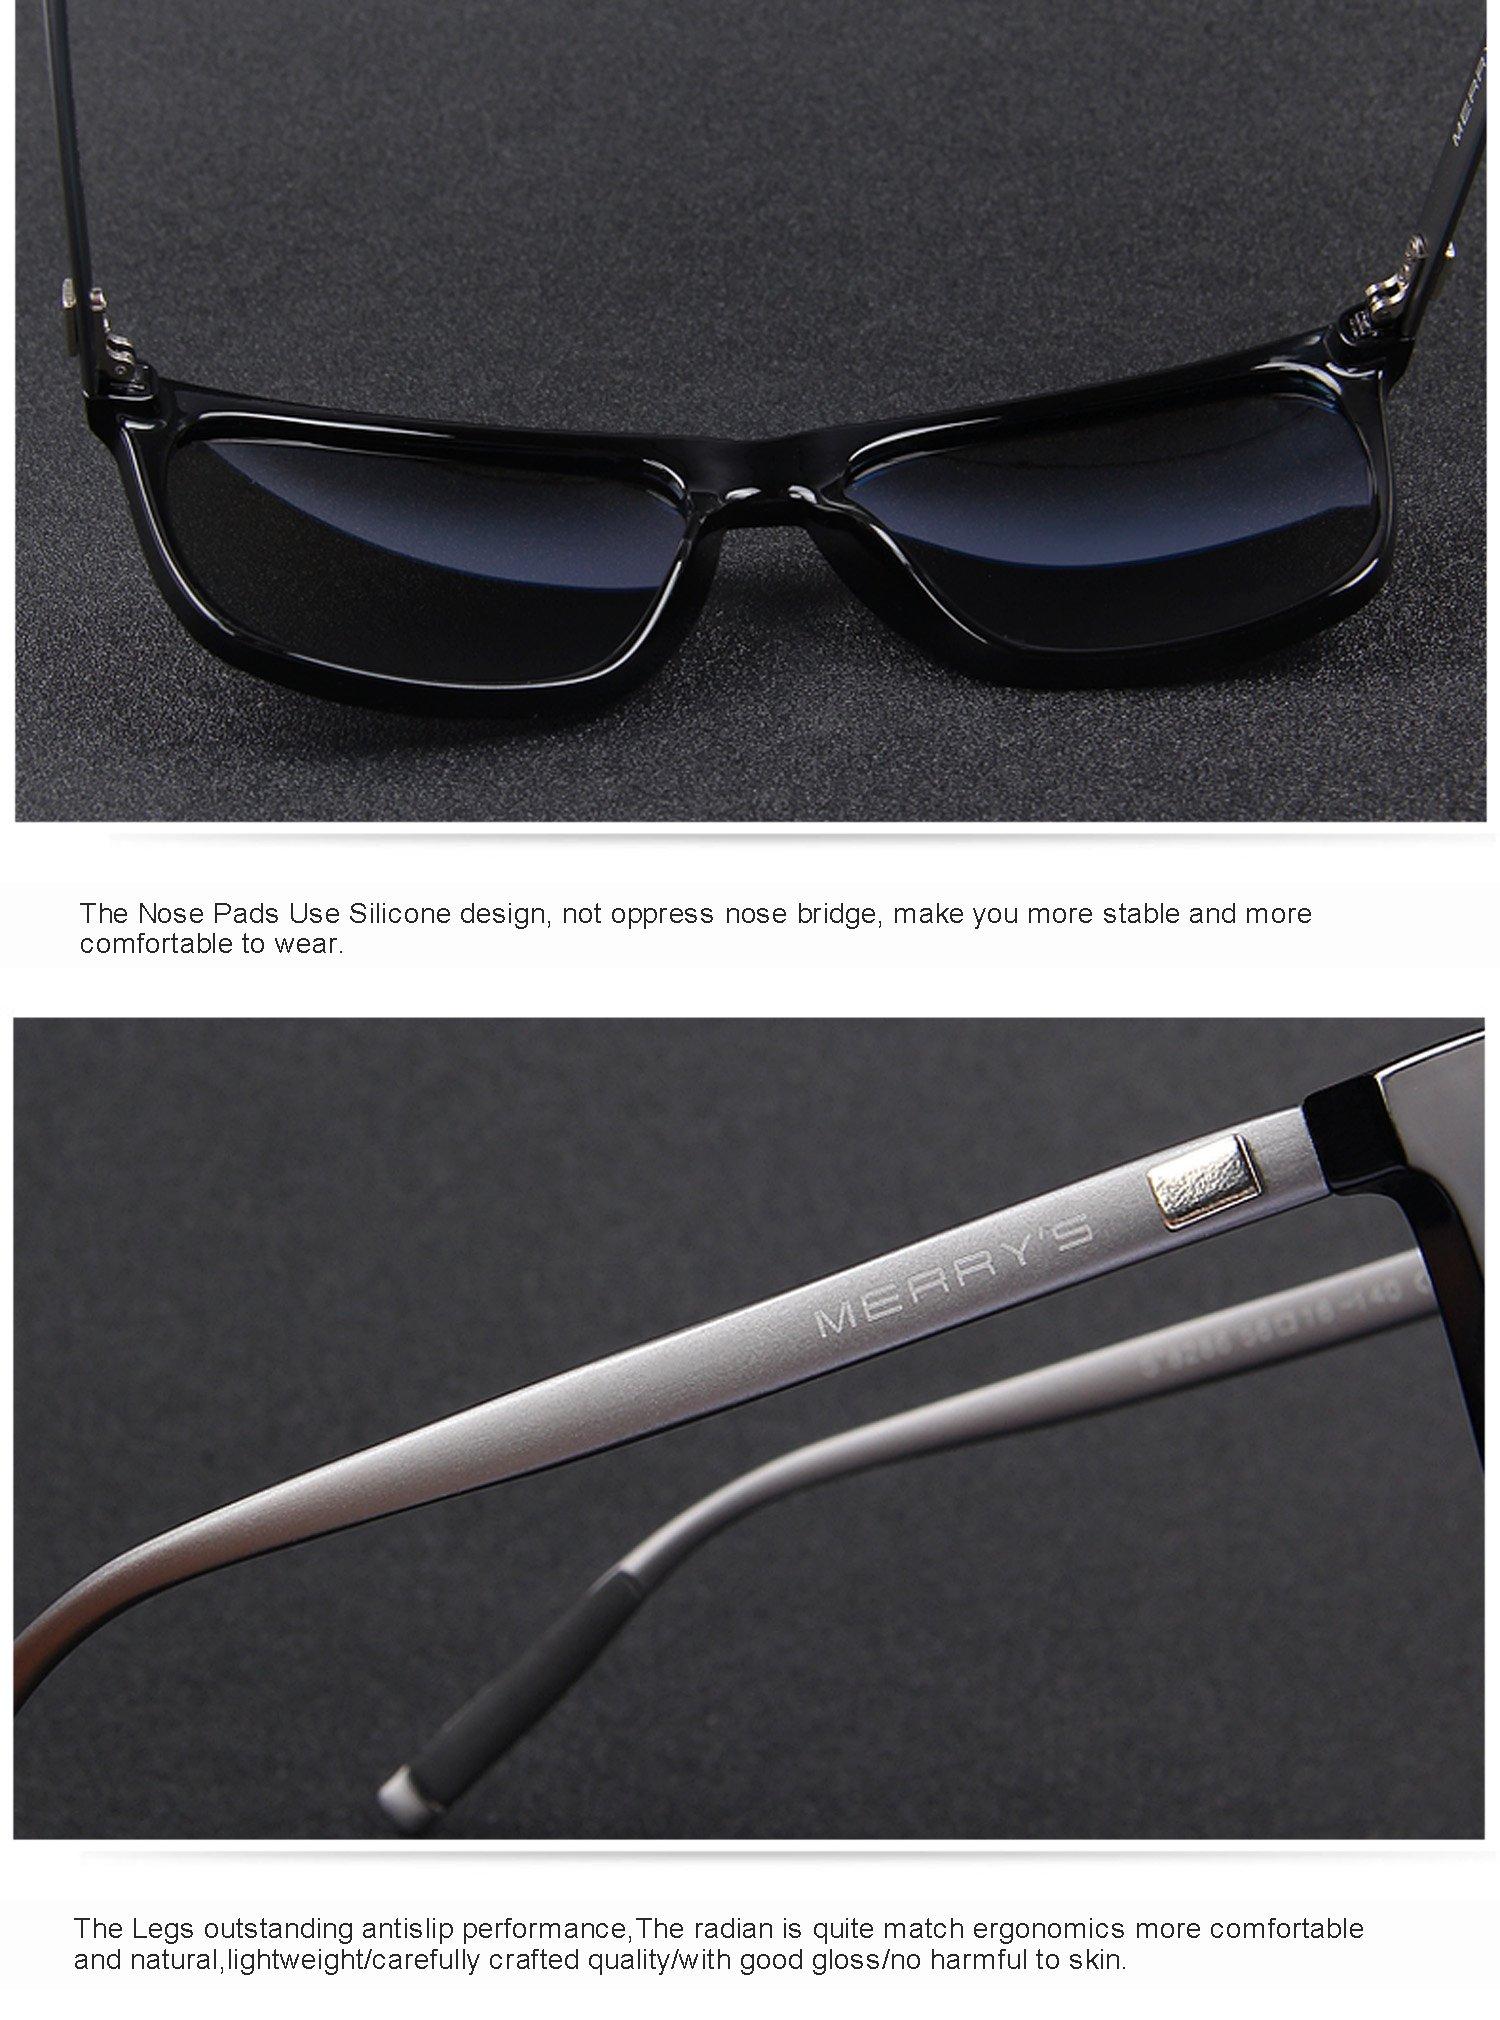 MERRY'S Unisex Polarized Aluminum Sunglasses Vintage Sun Glasses For Men/Women S8286 (Blue, 56) by MERRY'S (Image #8)